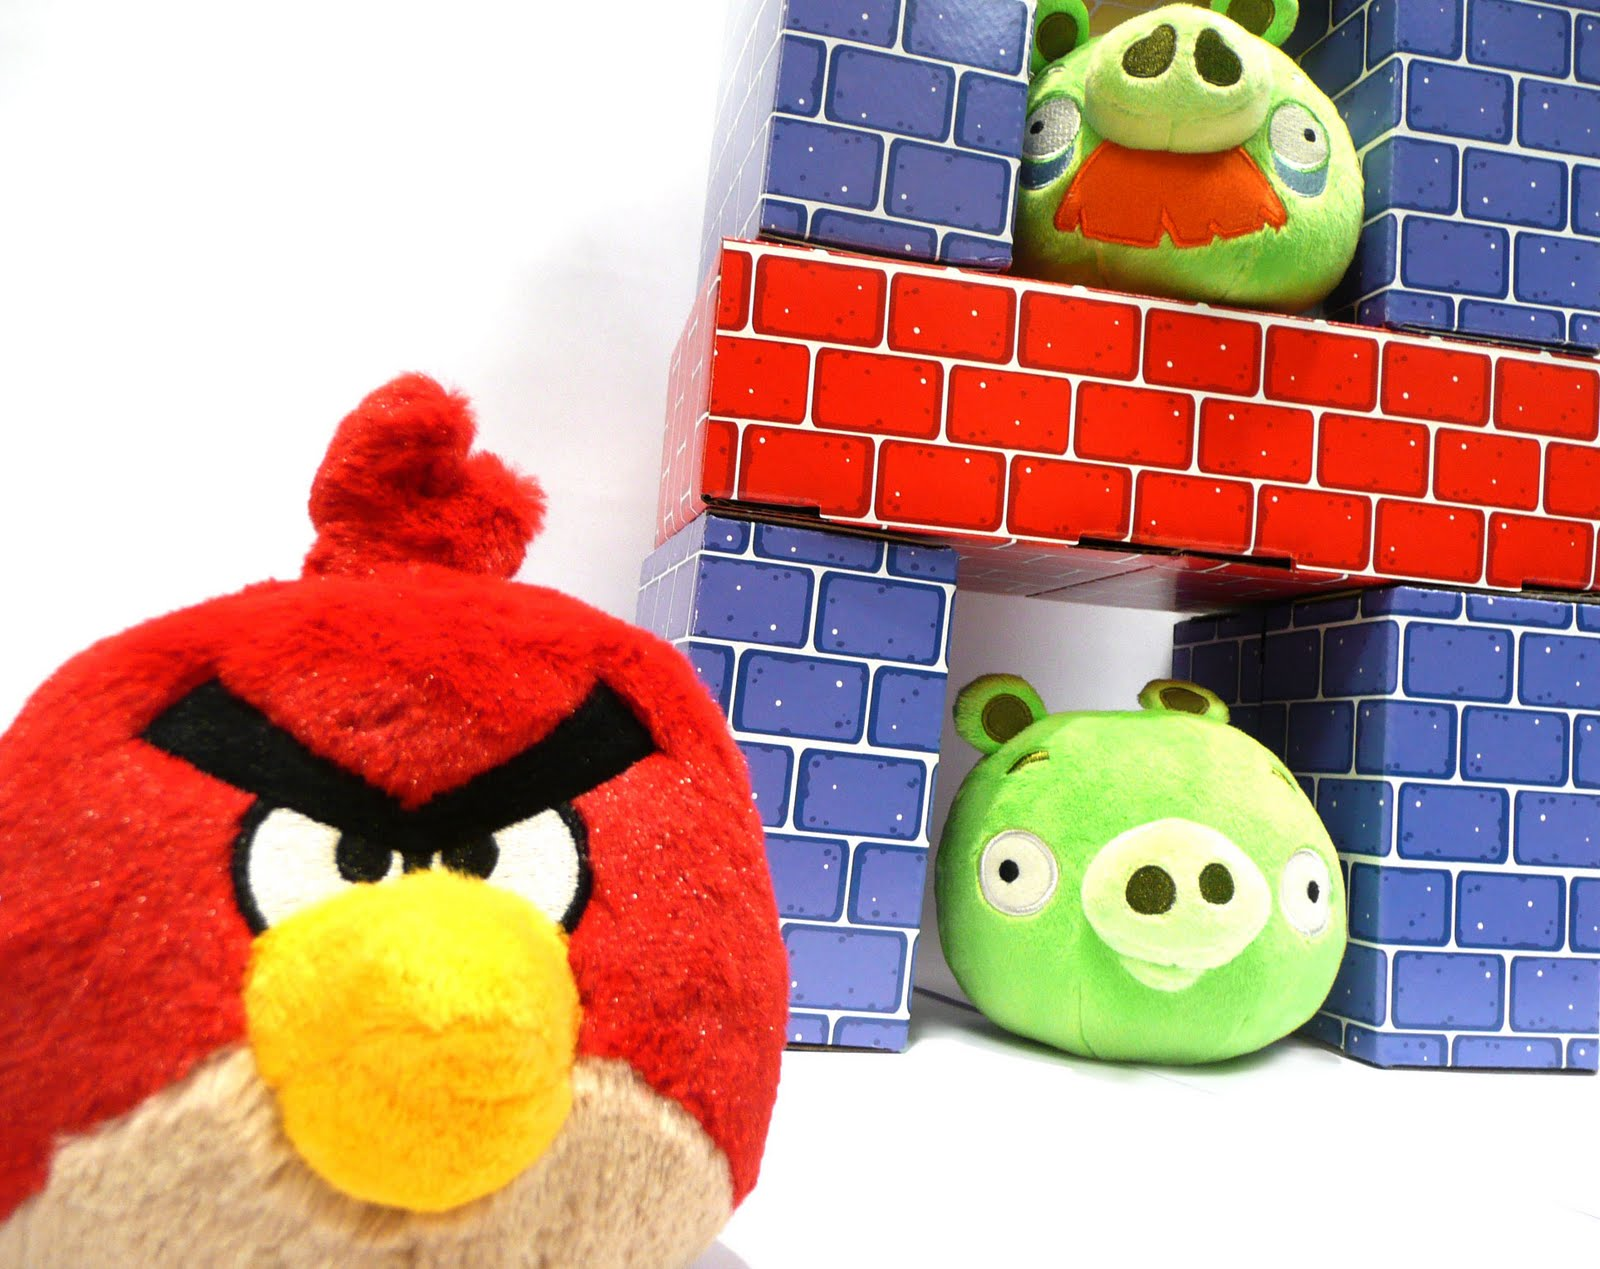 Kids club blog university village seattle do it yourself jumbo do it yourself jumbo angry birds game solutioingenieria Choice Image